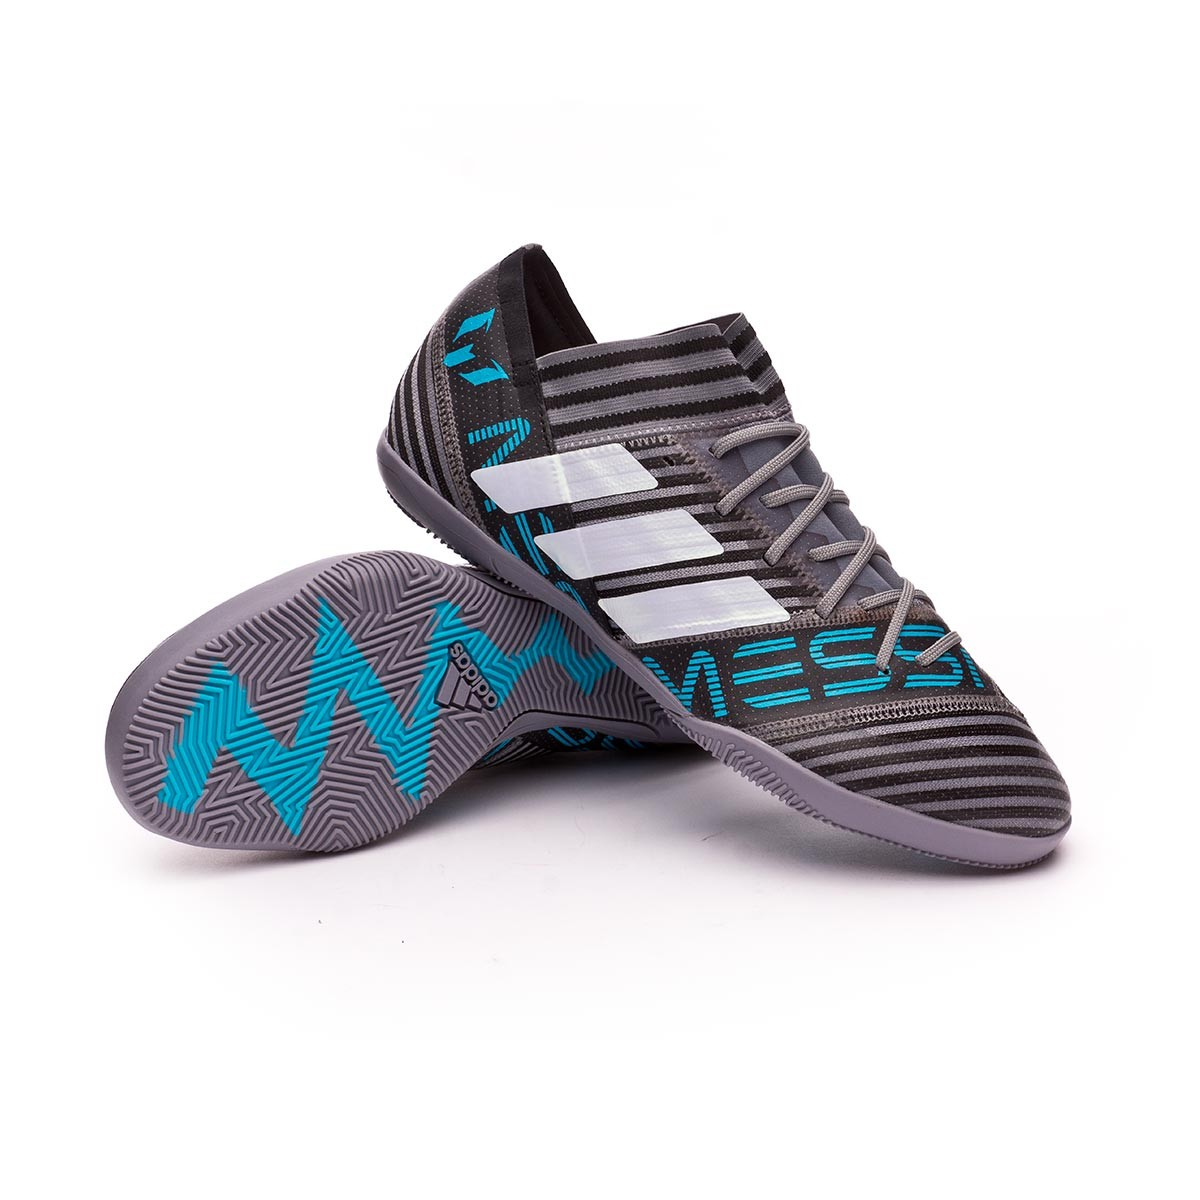 reputable site 32c37 76787 adidas Nemeziz Messi Tango 17.3 IN Futsal Boot